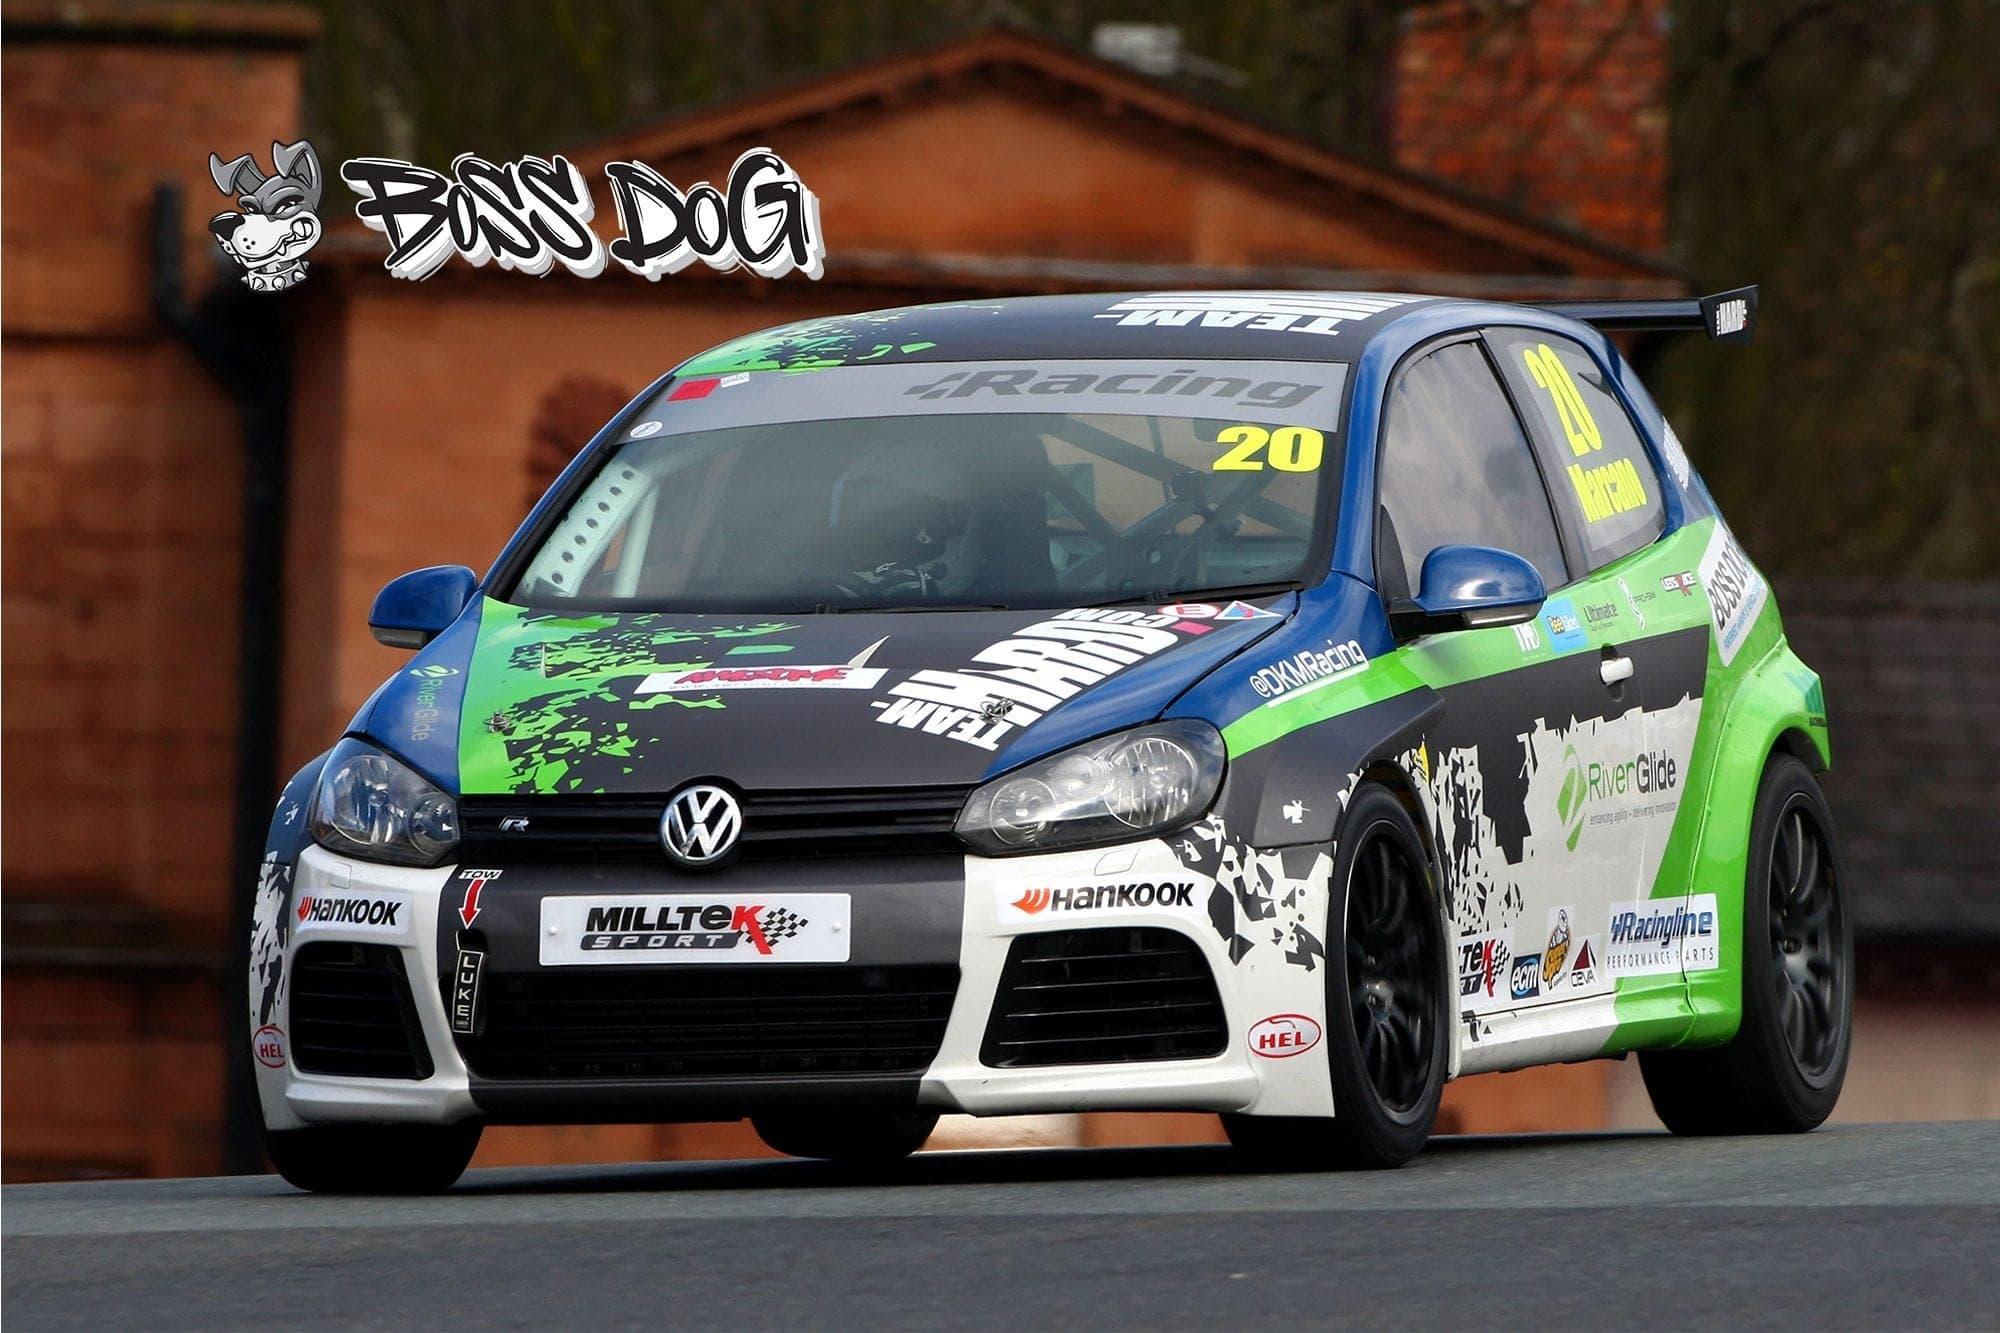 VW Golf MK5 team hard vw golf cup racing graphics